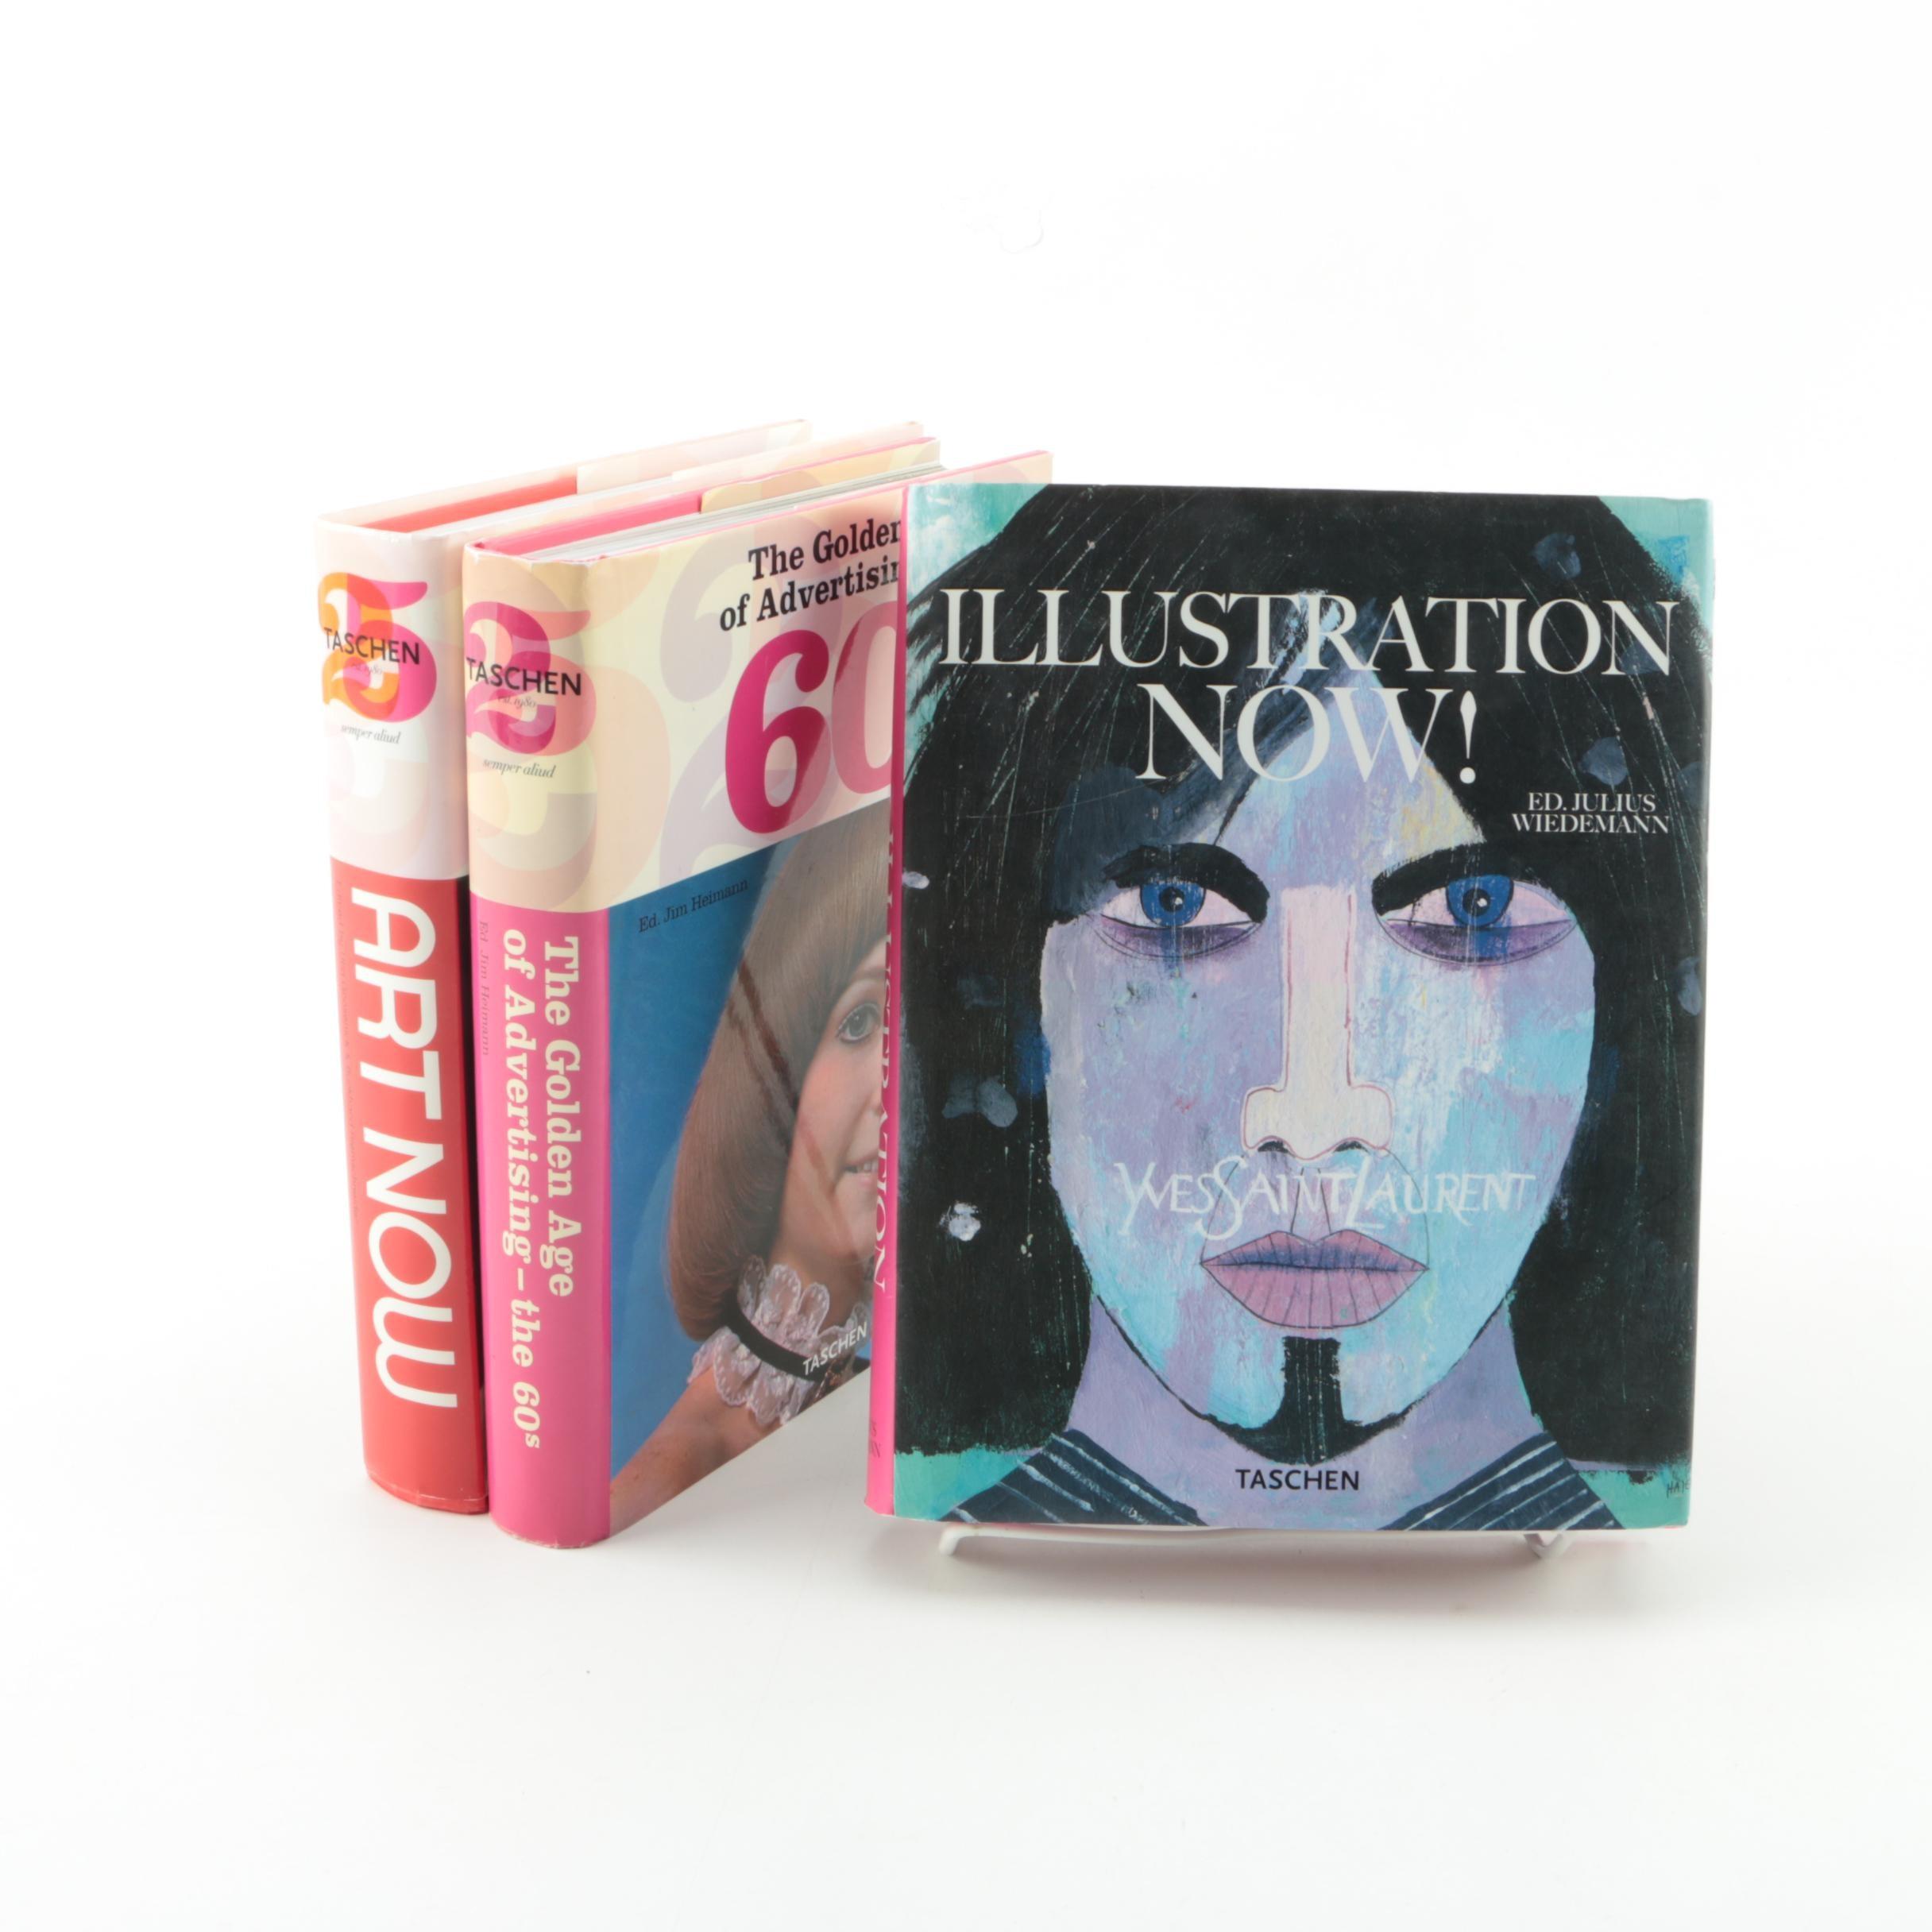 Art Books from Taschen Publishing